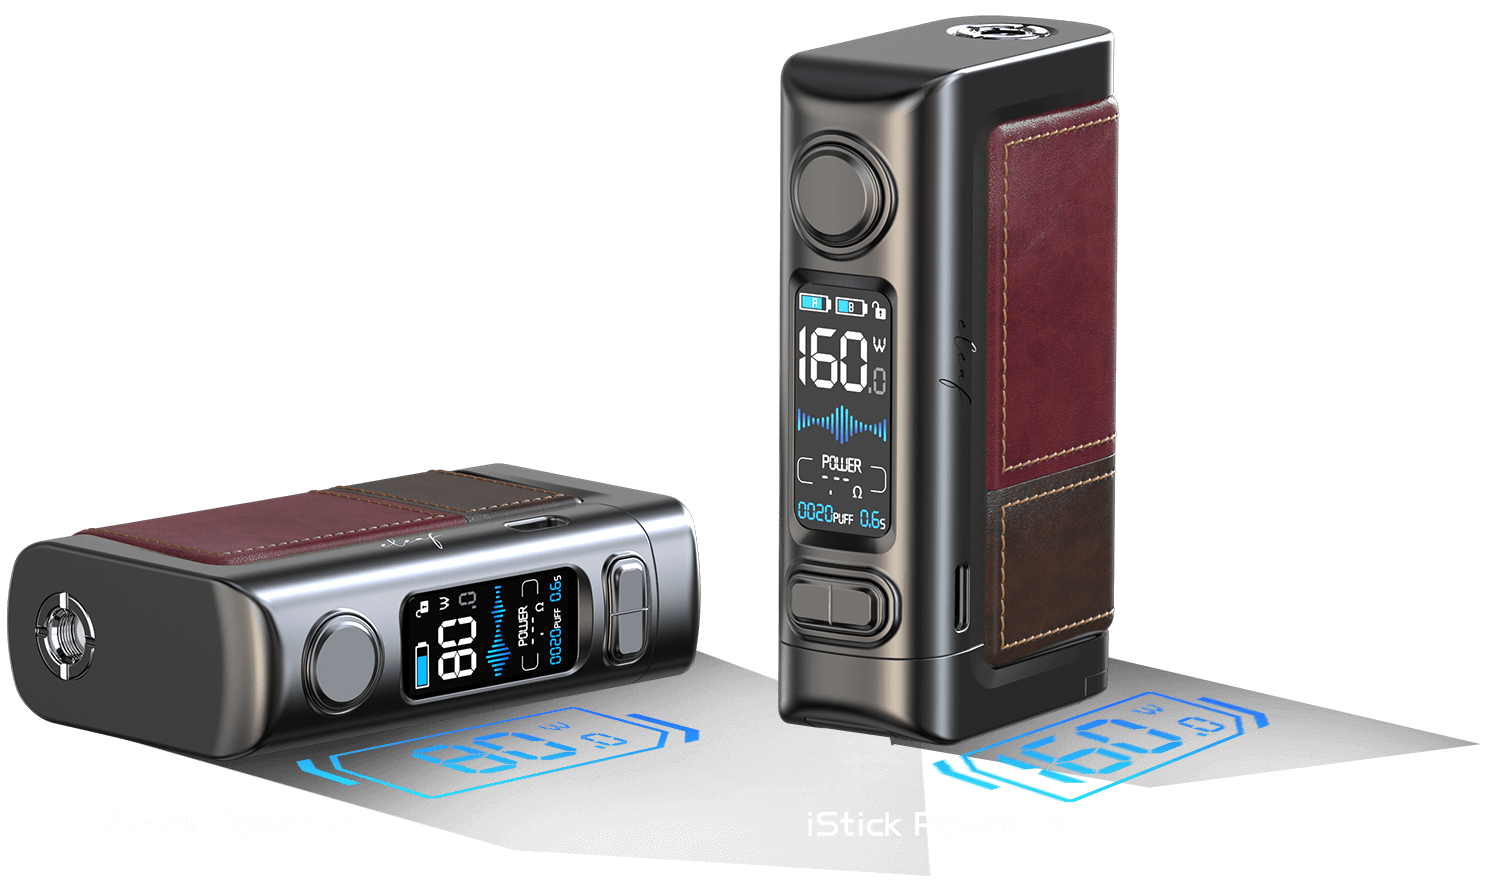 iStick Power 2